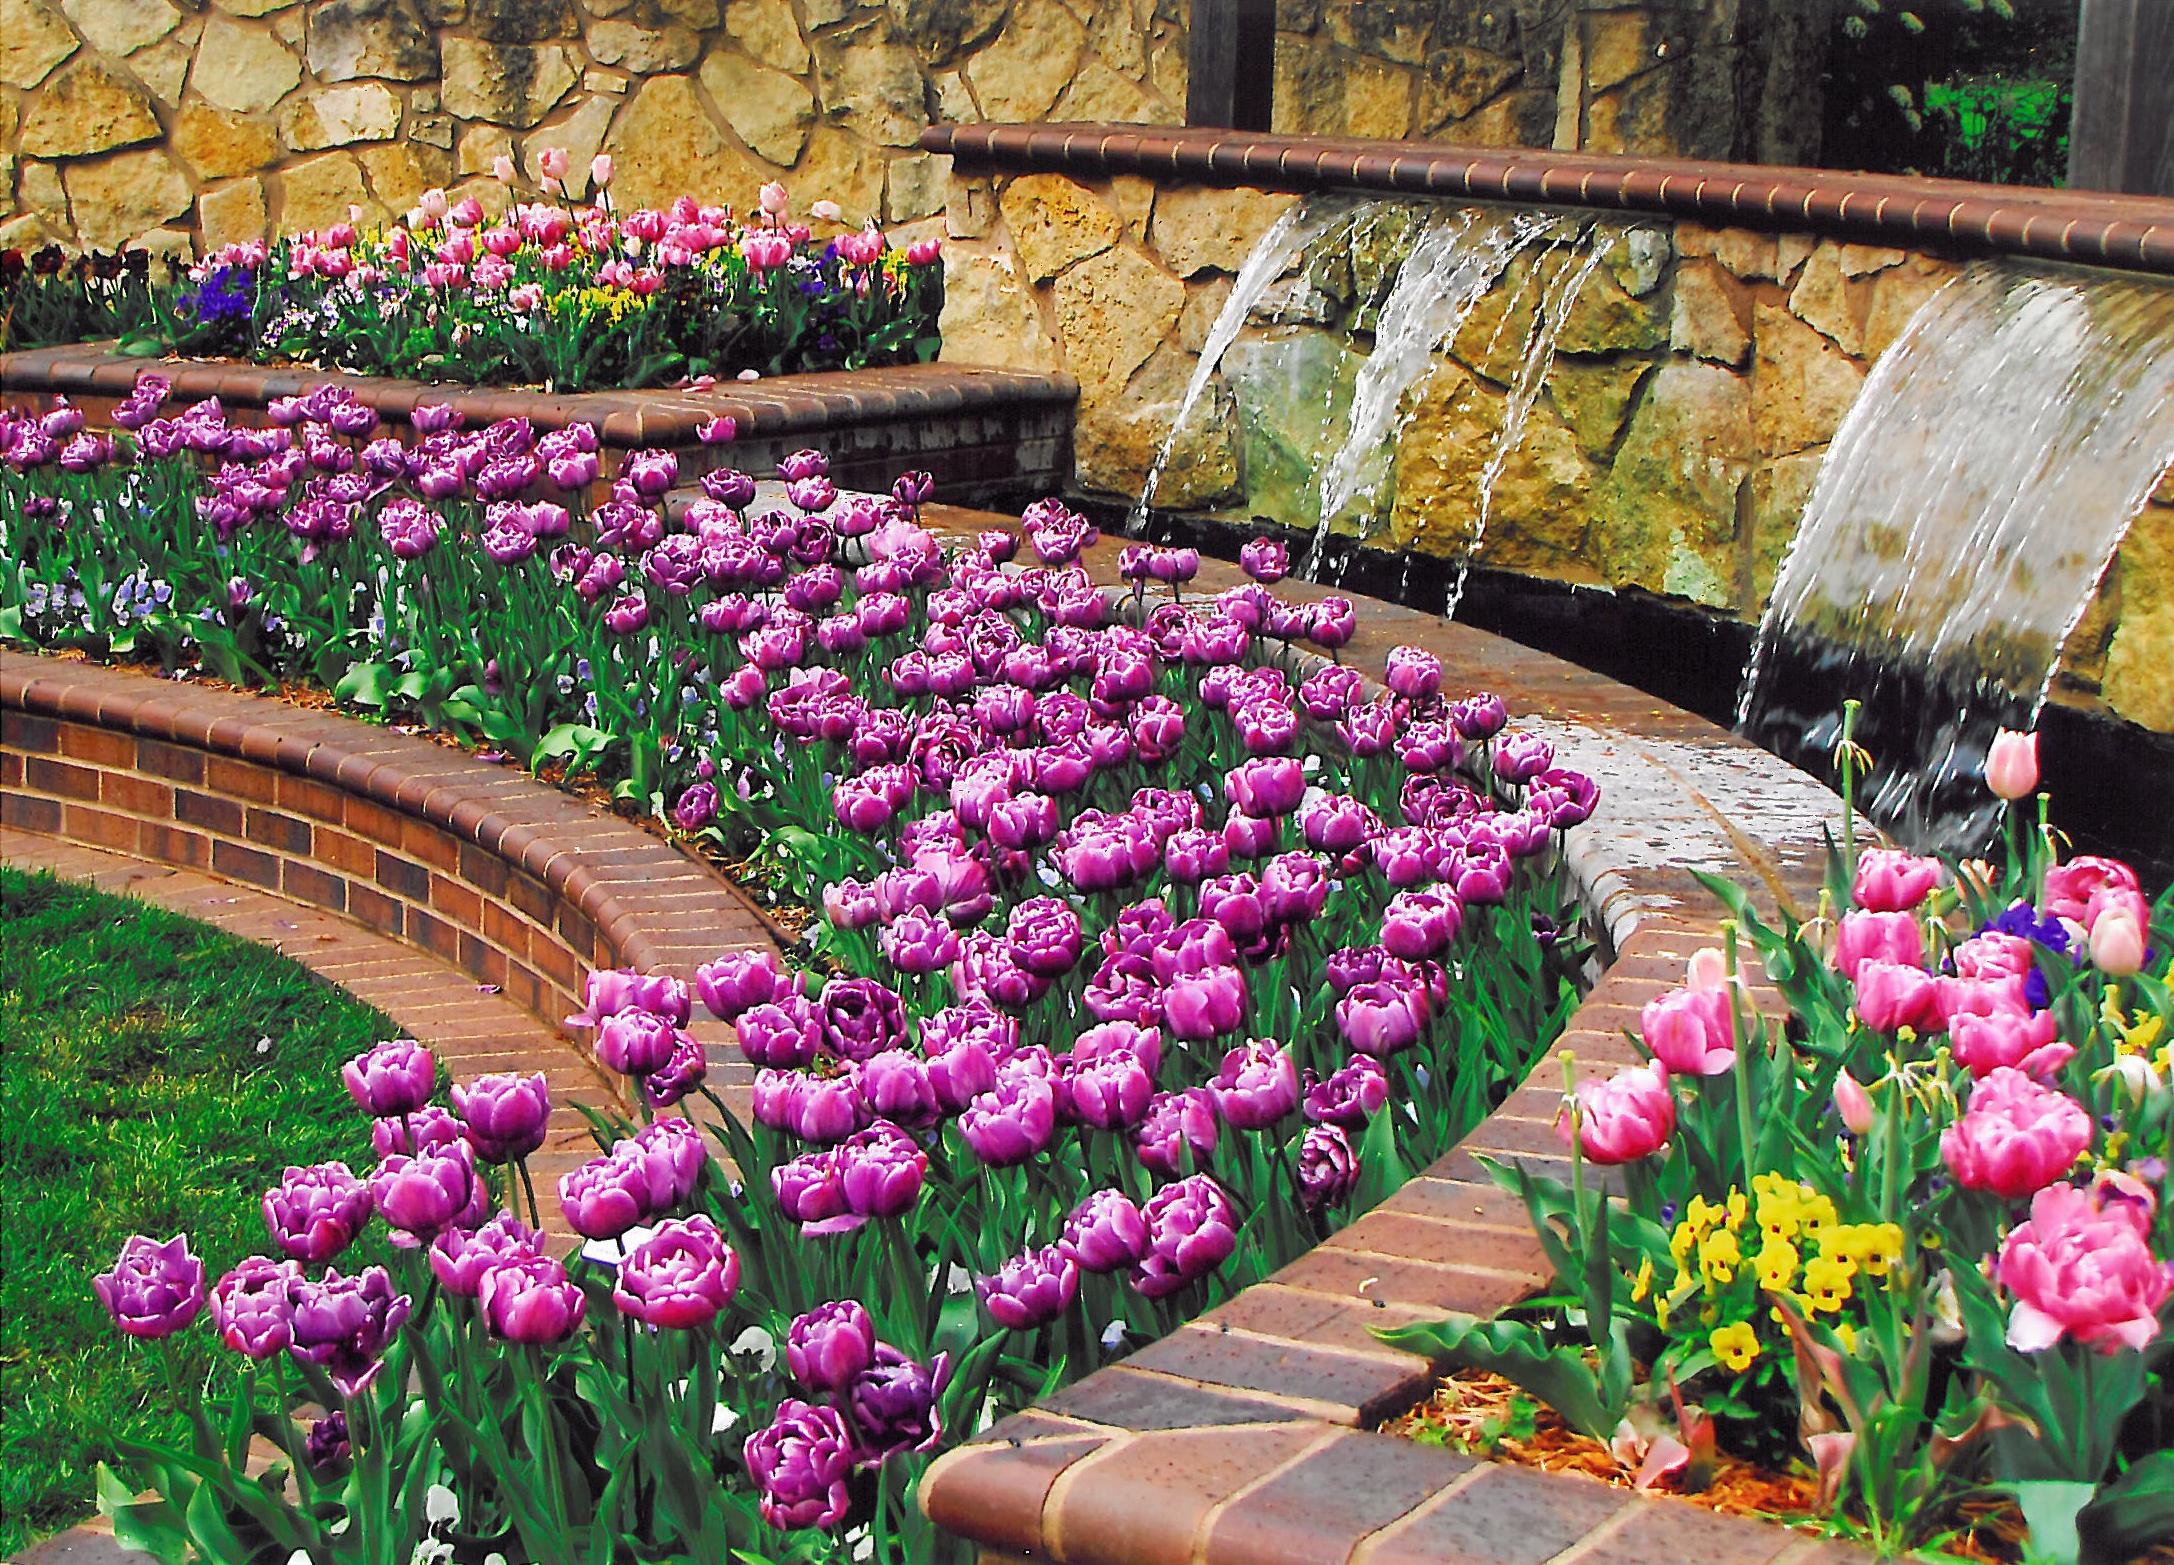 kansas orchid society annual fall show | wichita, ks 67203